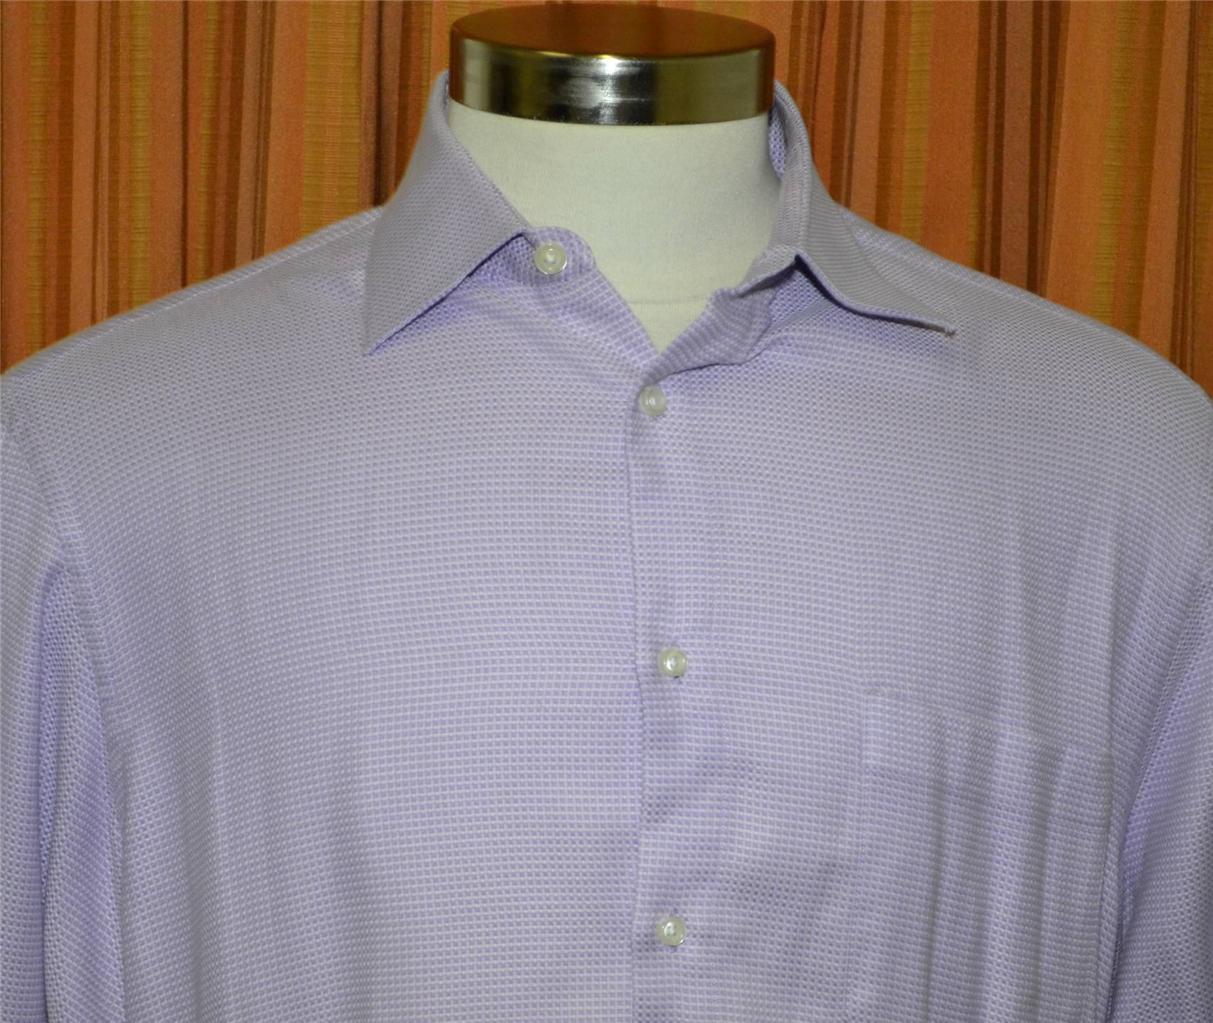 Hugo Boss Long Sleeve Light Purple Lavender 100 Cotton